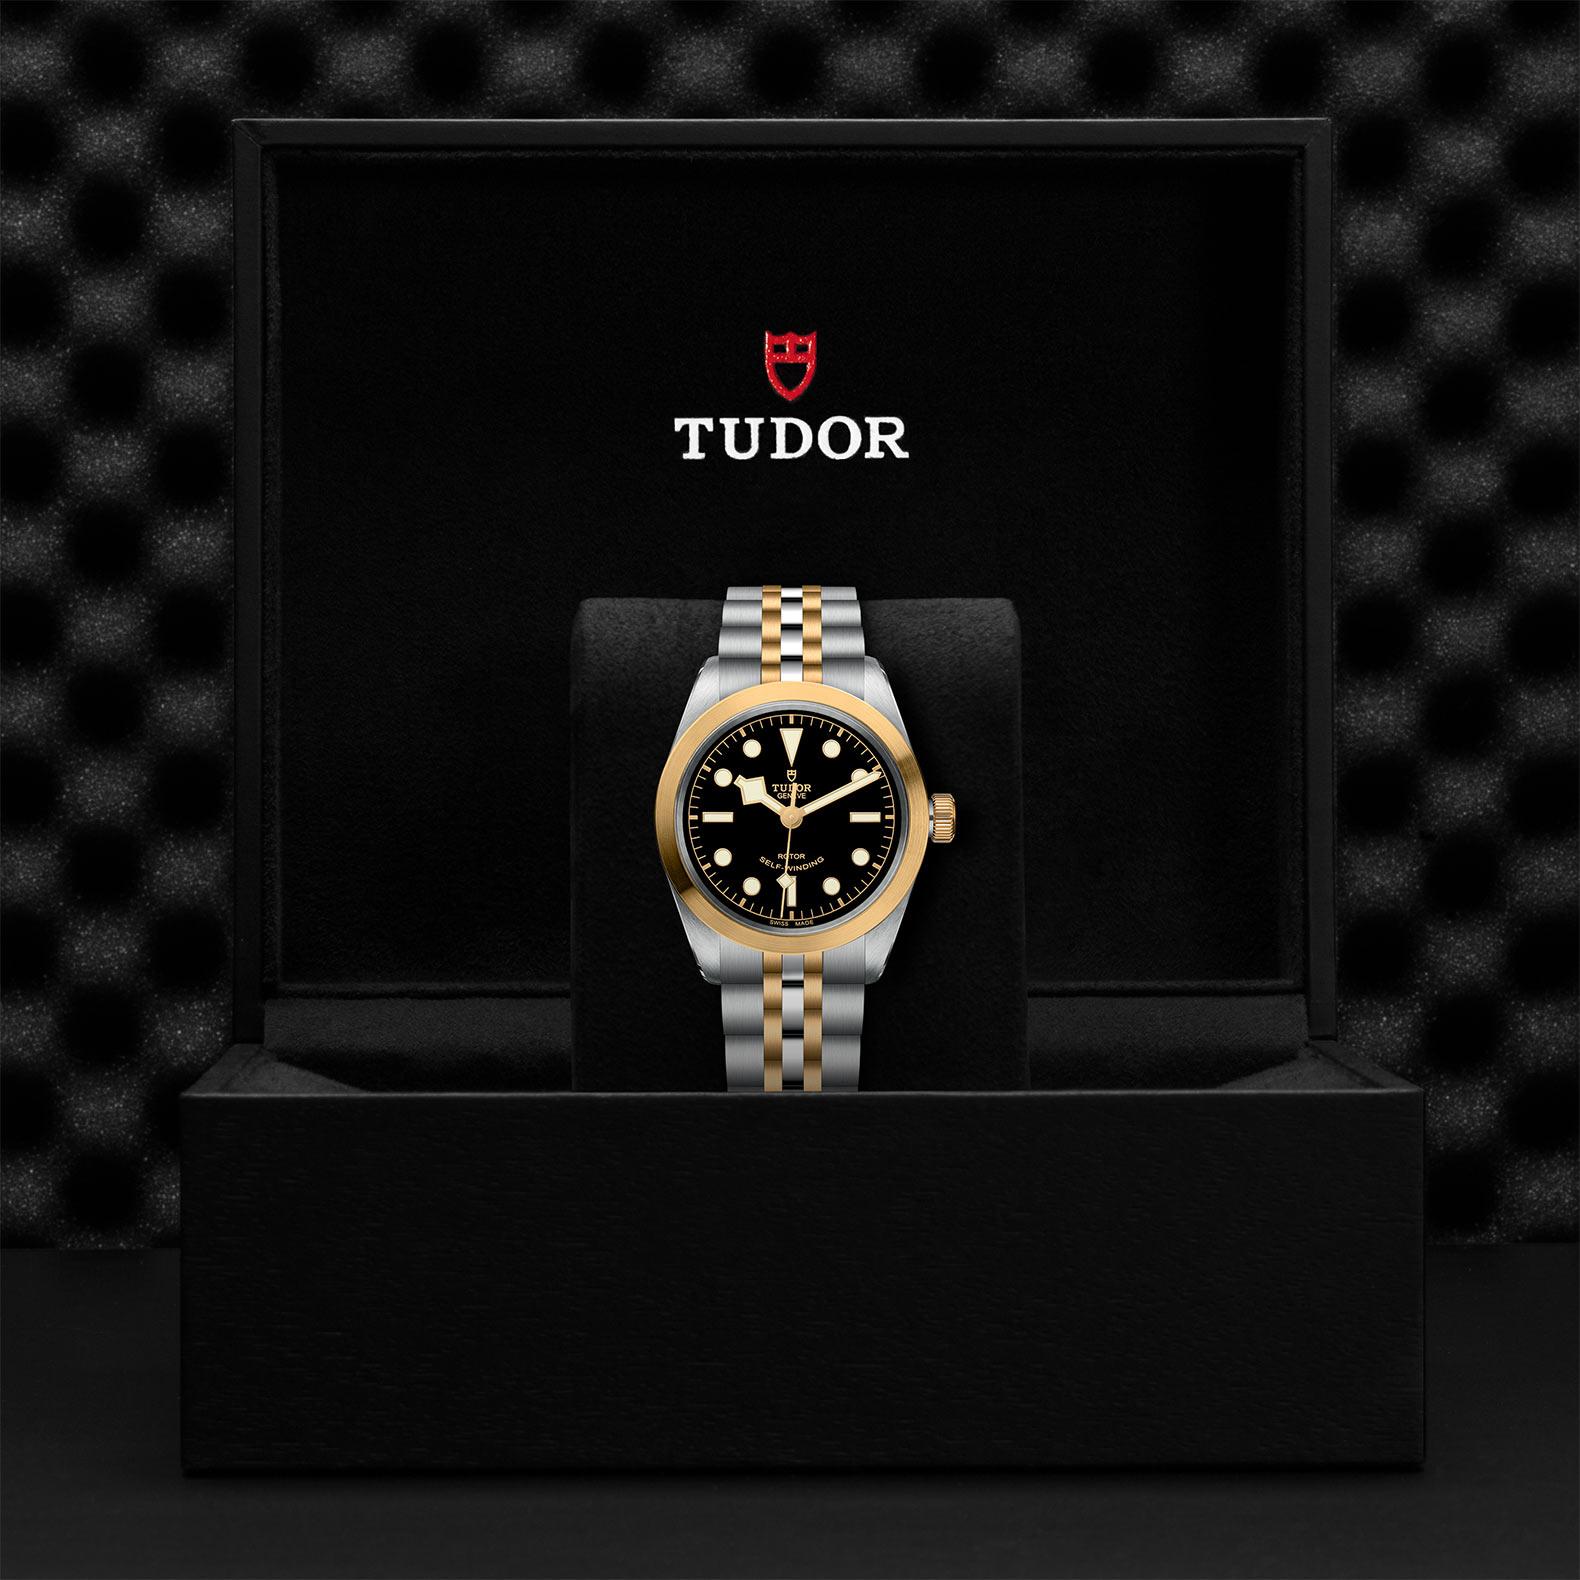 TUDOR Black Bay 36 SG M79503 0001 Presentation